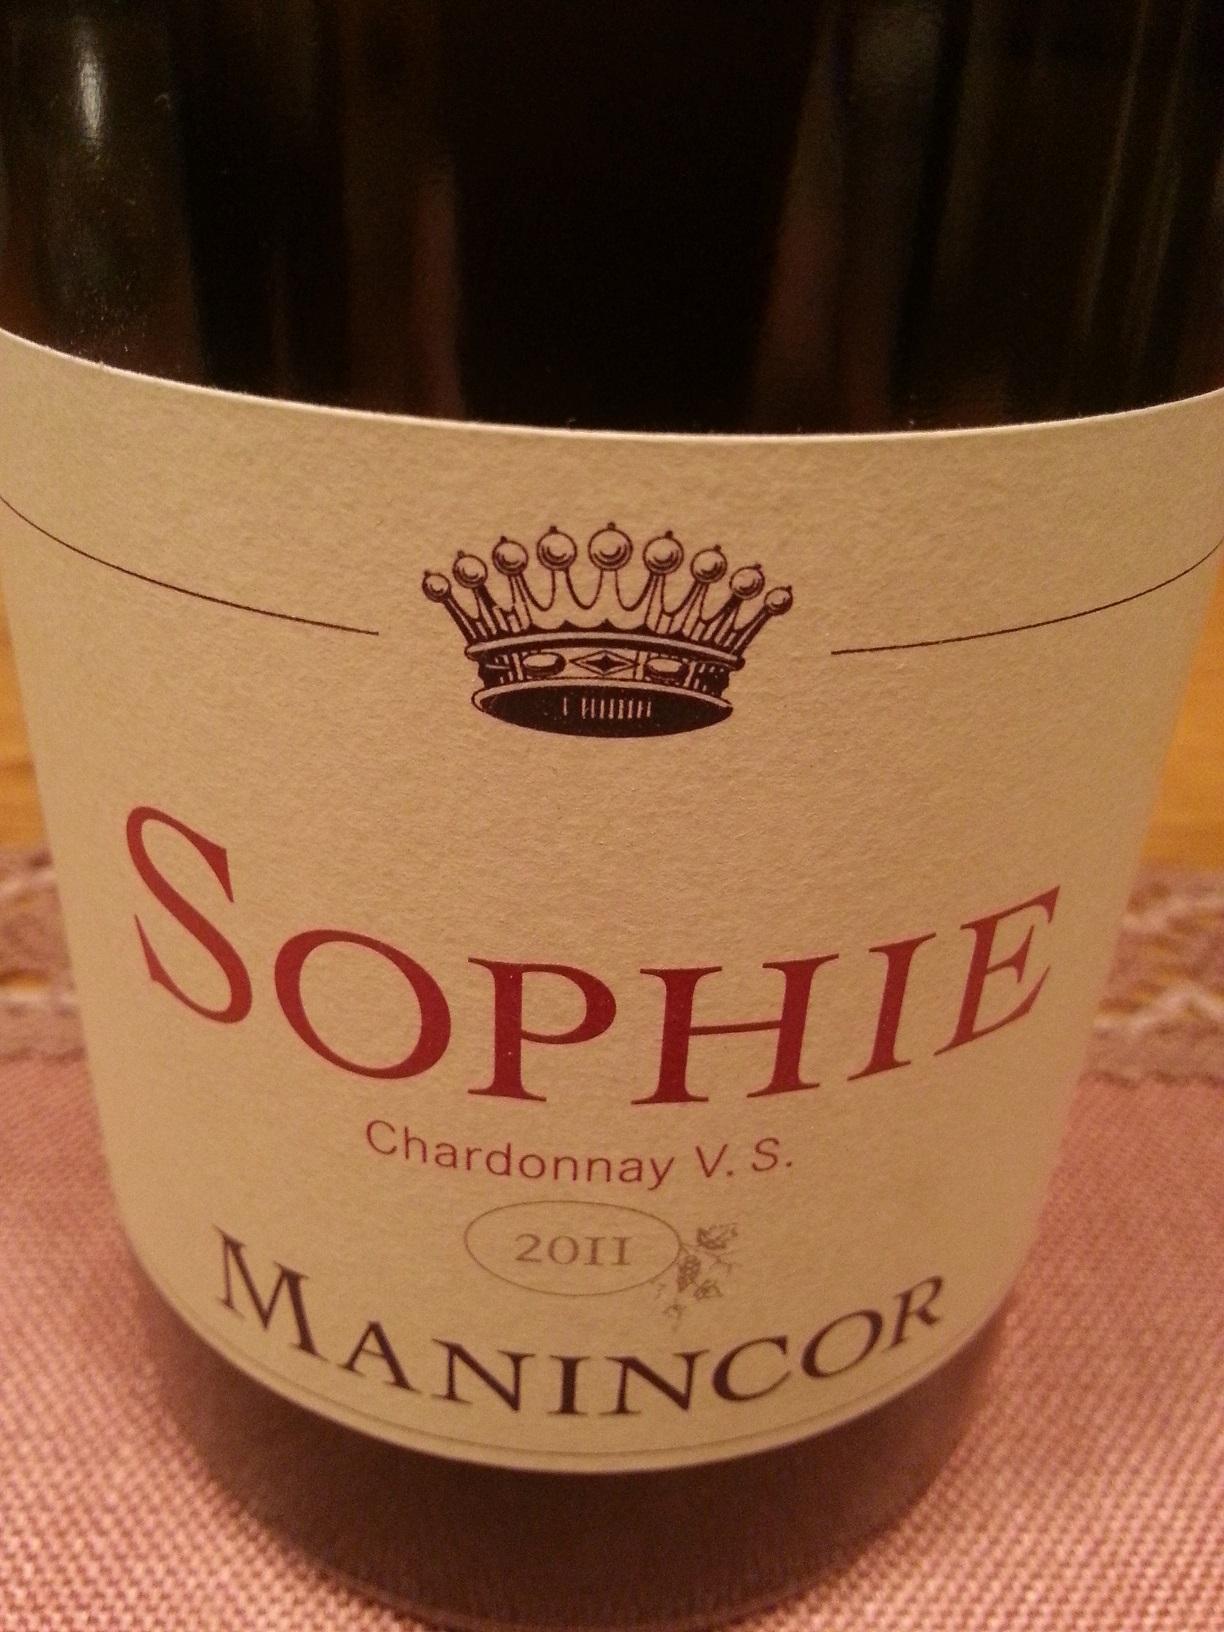 2011 Chardonnay Sophie | Manincor